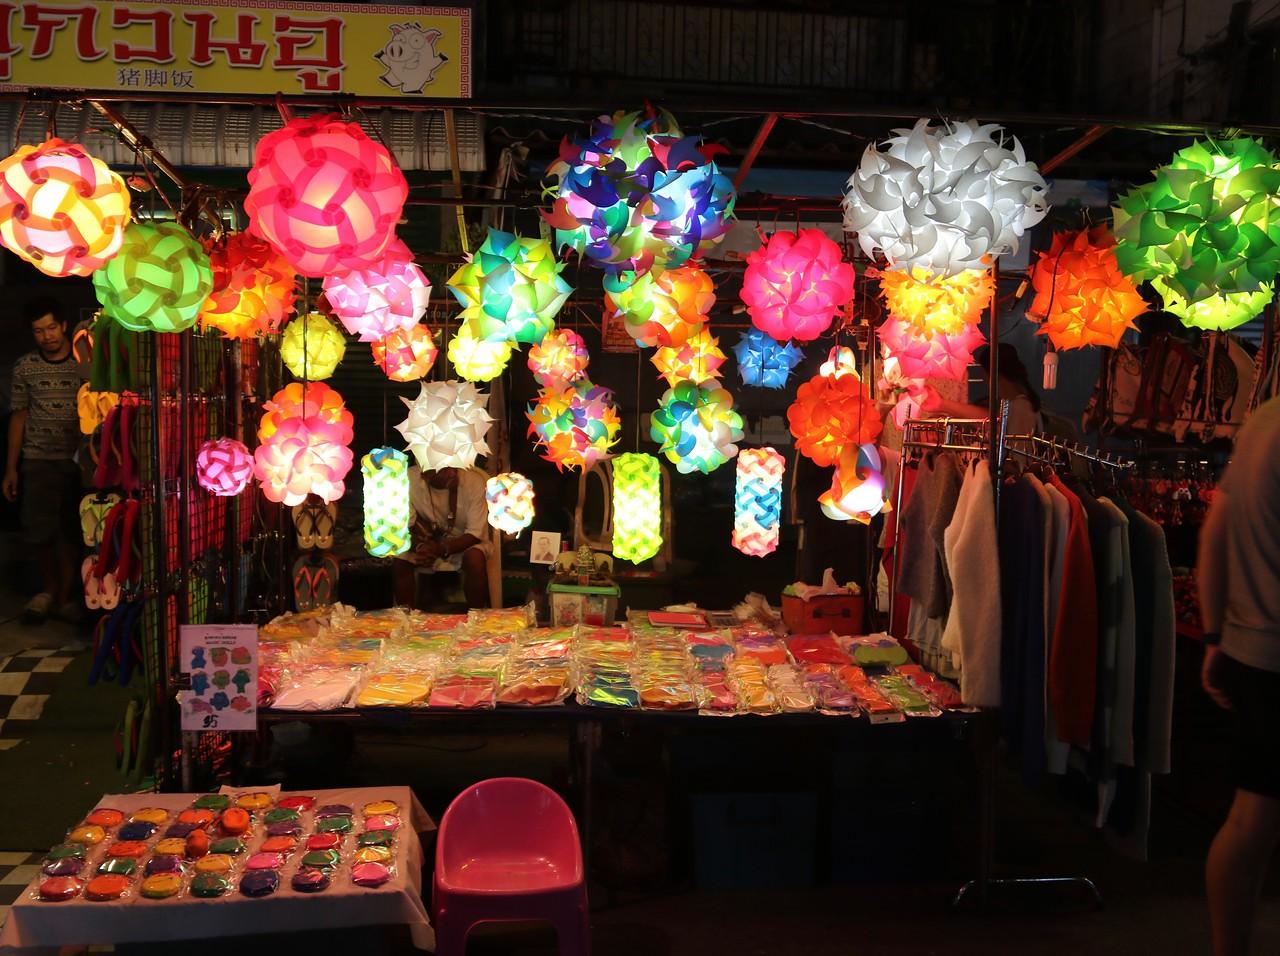 Silver street night market